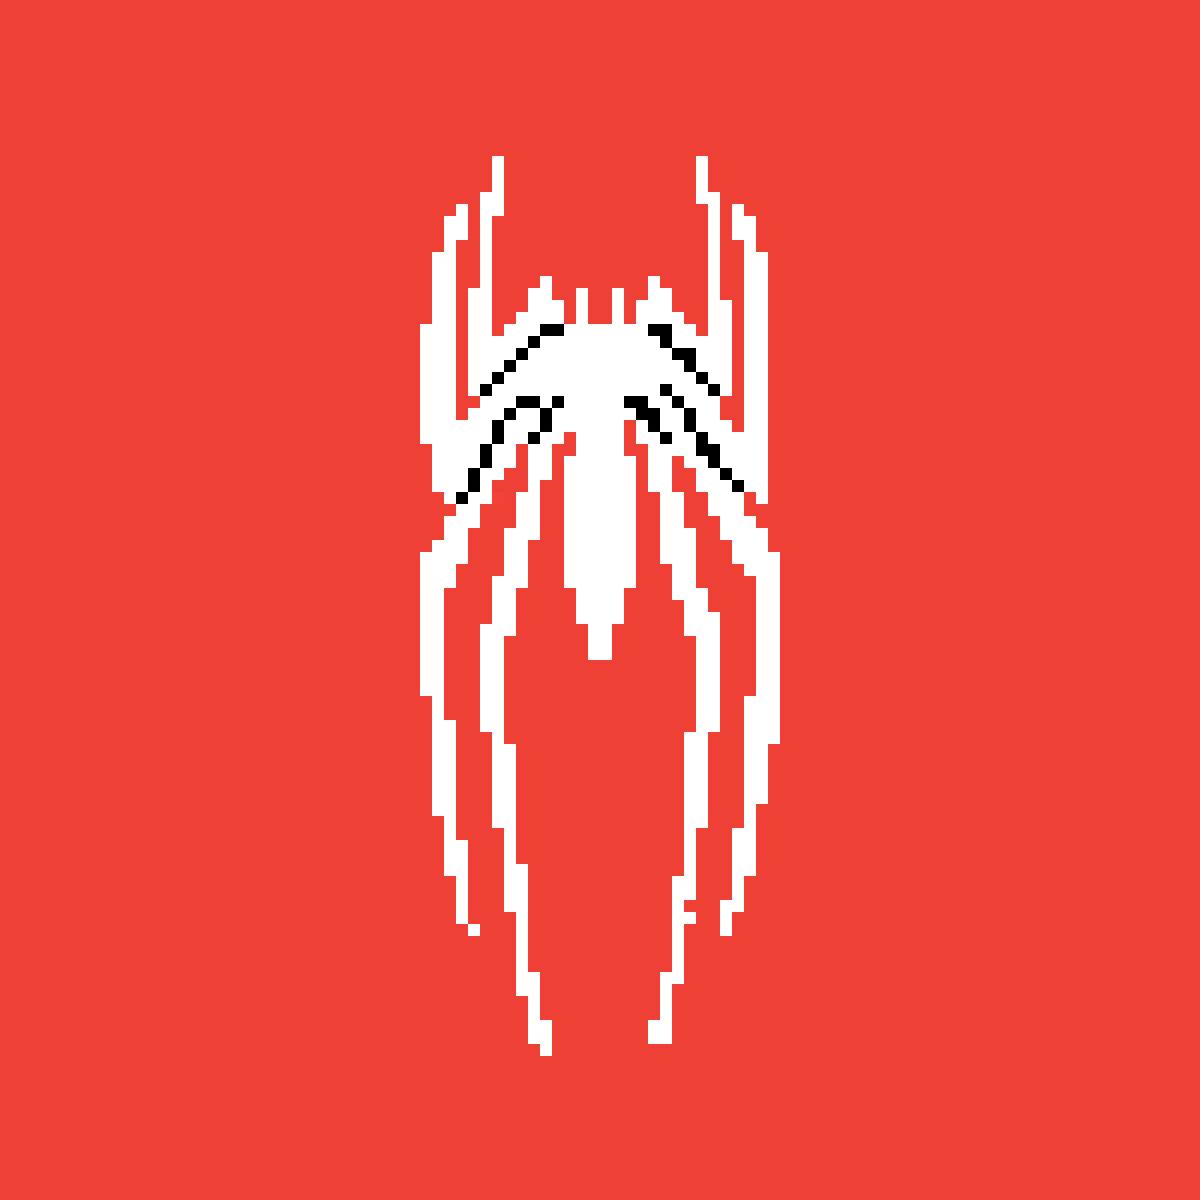 Pixilart Spiderman Symbol By Phanther